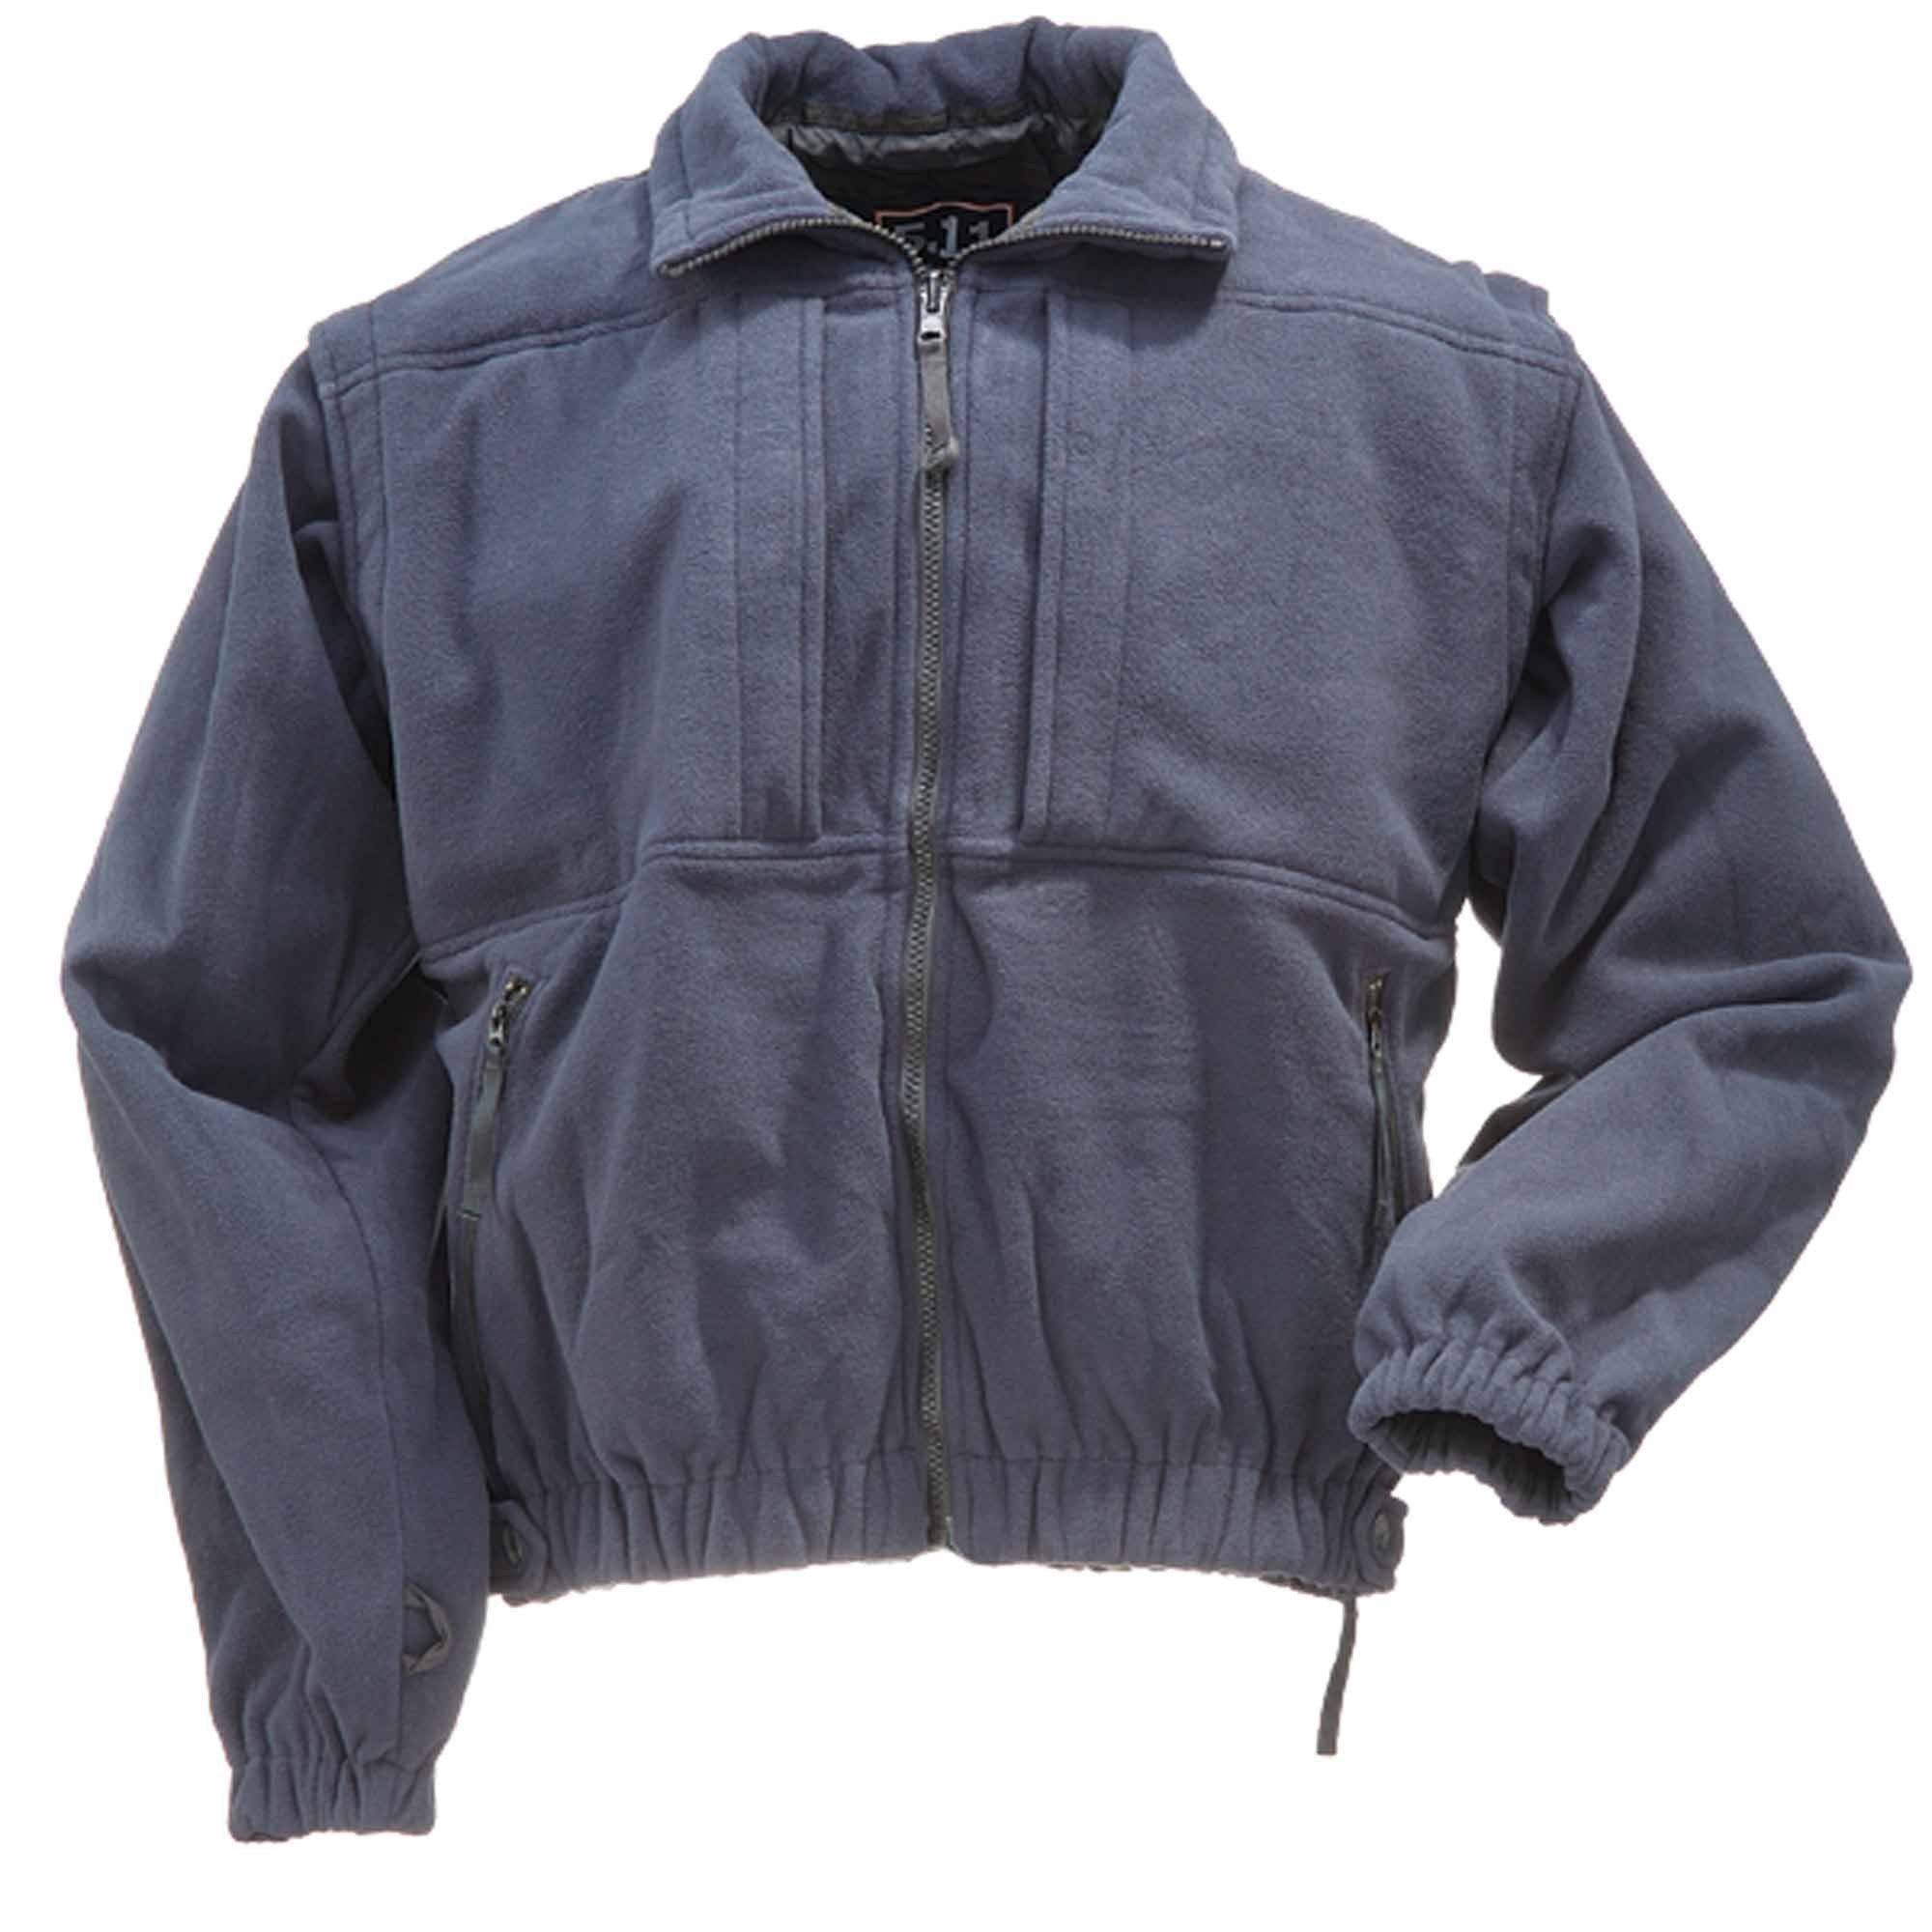 5.11 5-in-1 Jacket